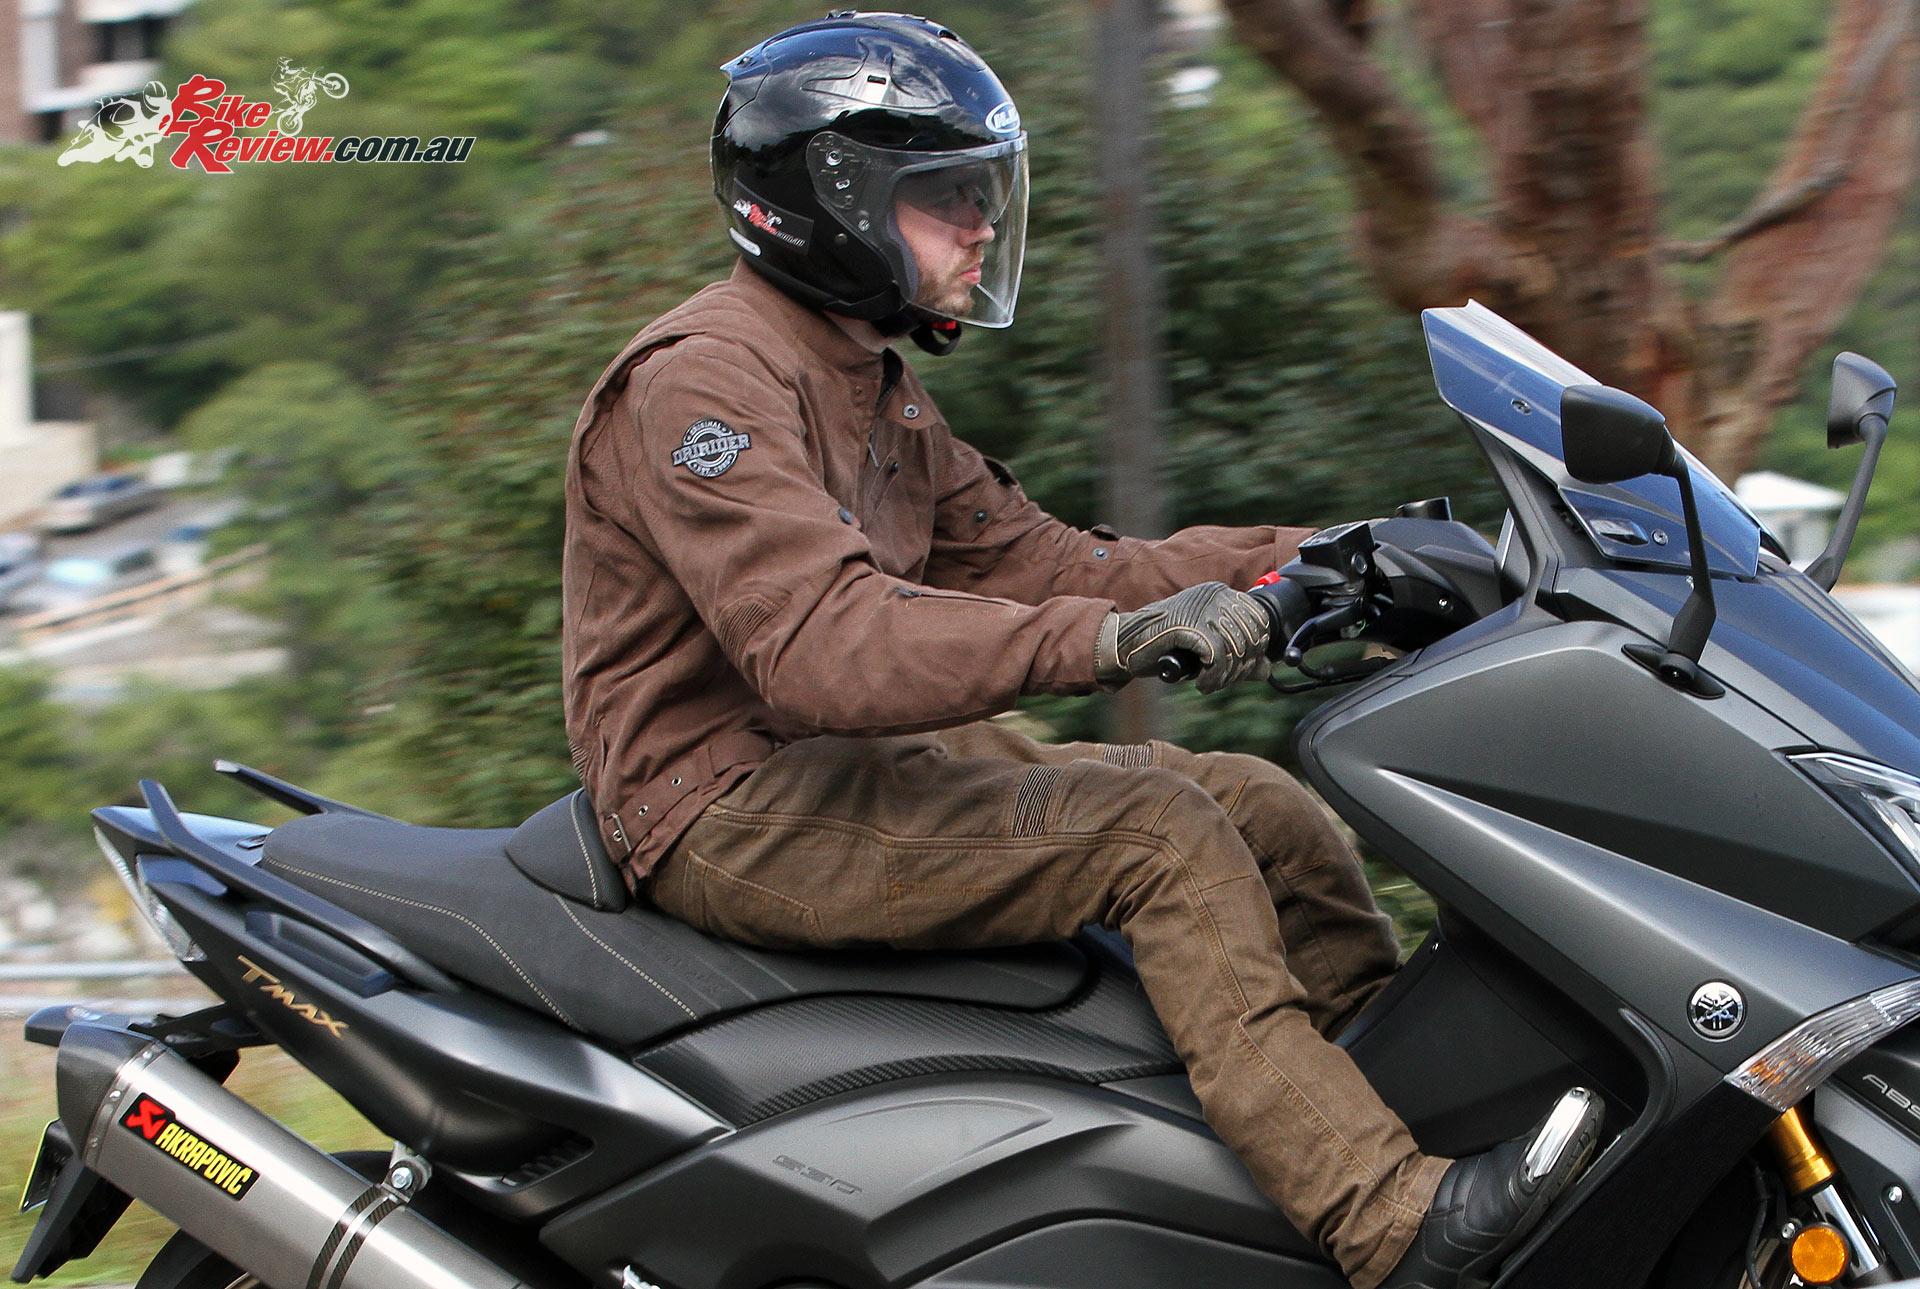 Gear Review Dririder Scrambler Jacket Bike Review